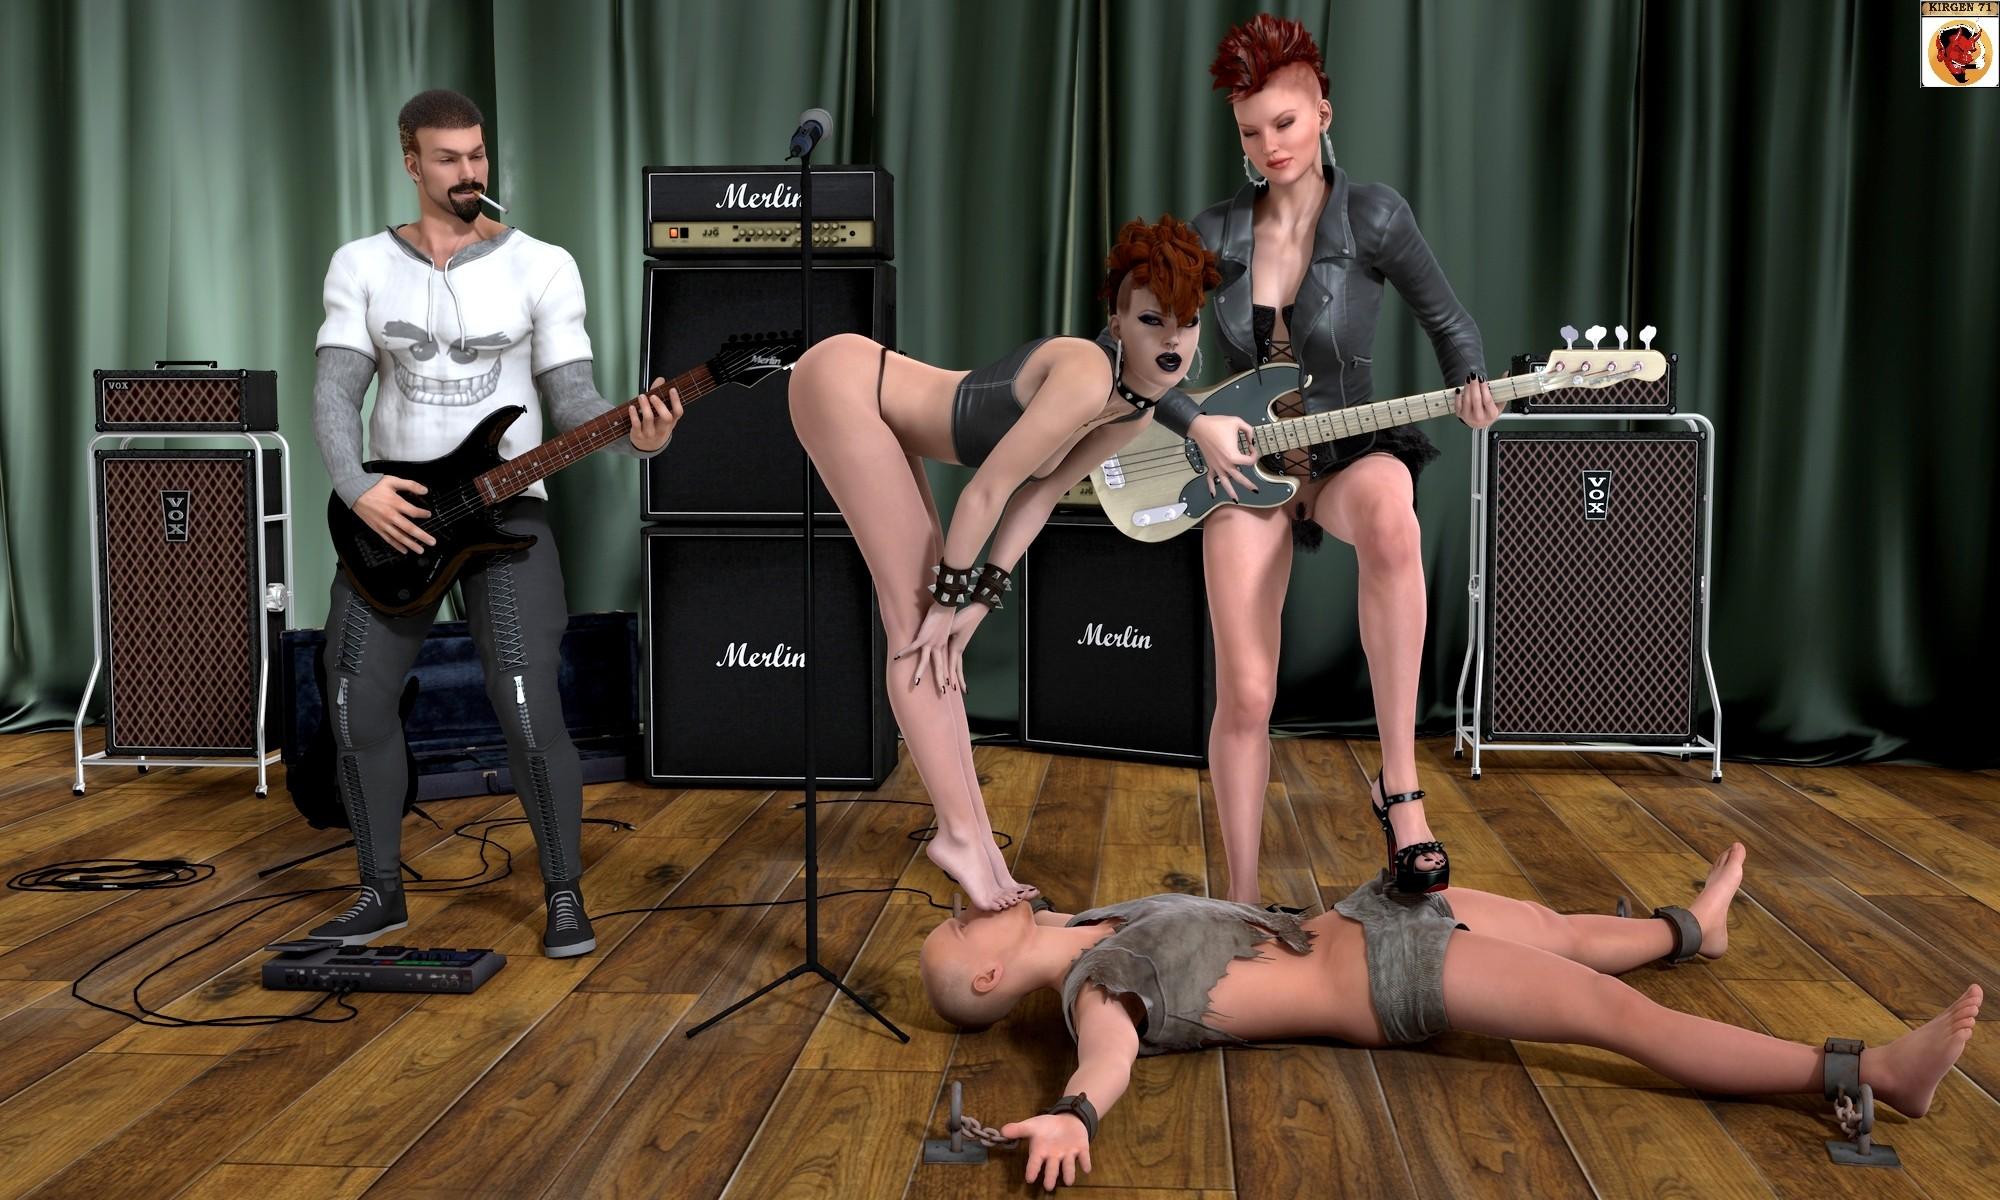 femdom-digital-art-4-27